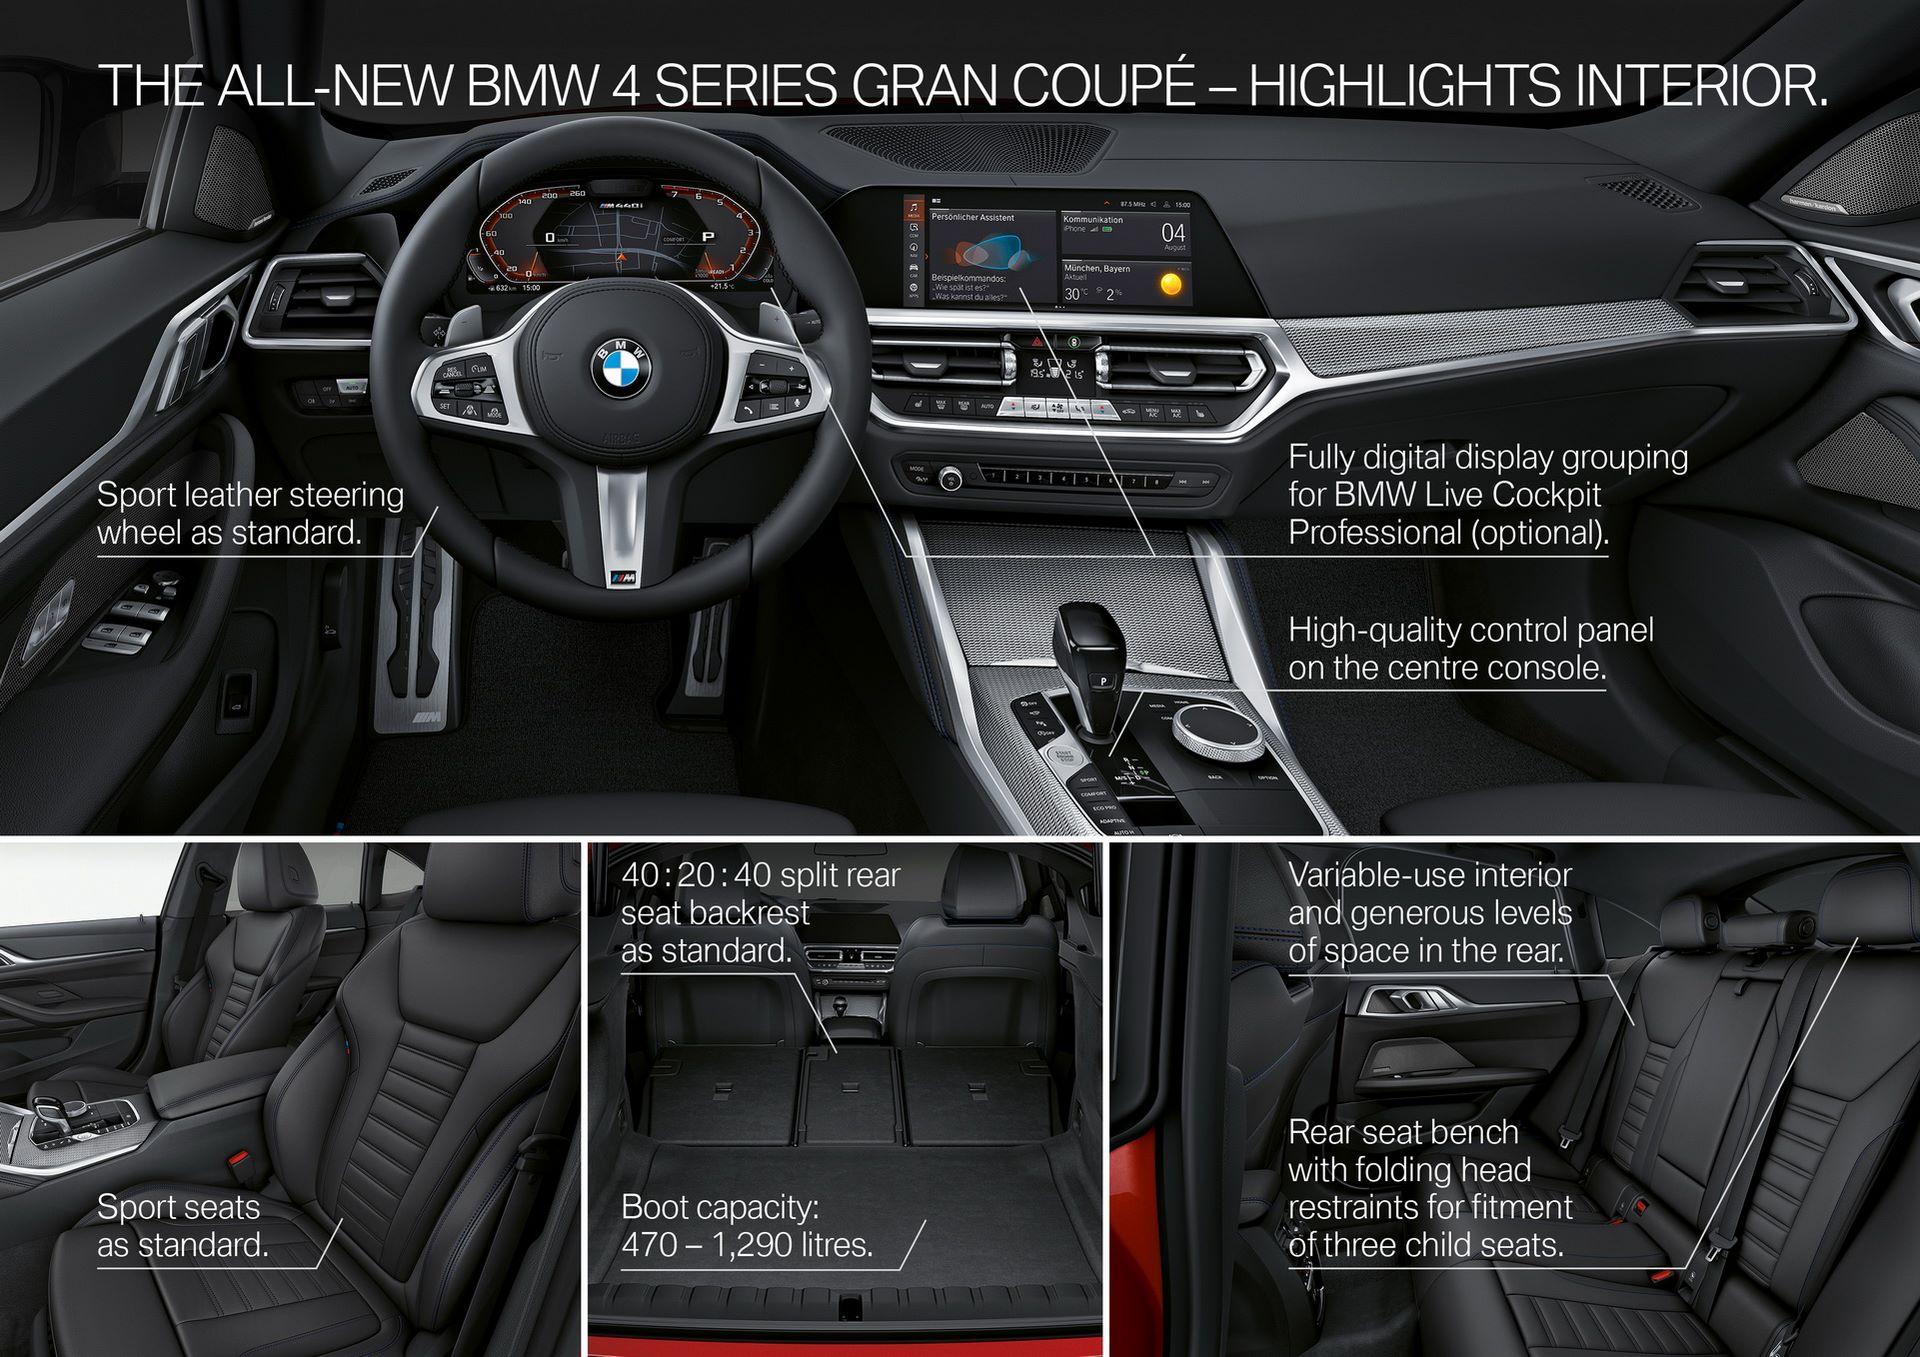 BMW-4-Series-Gran-Coupe-67